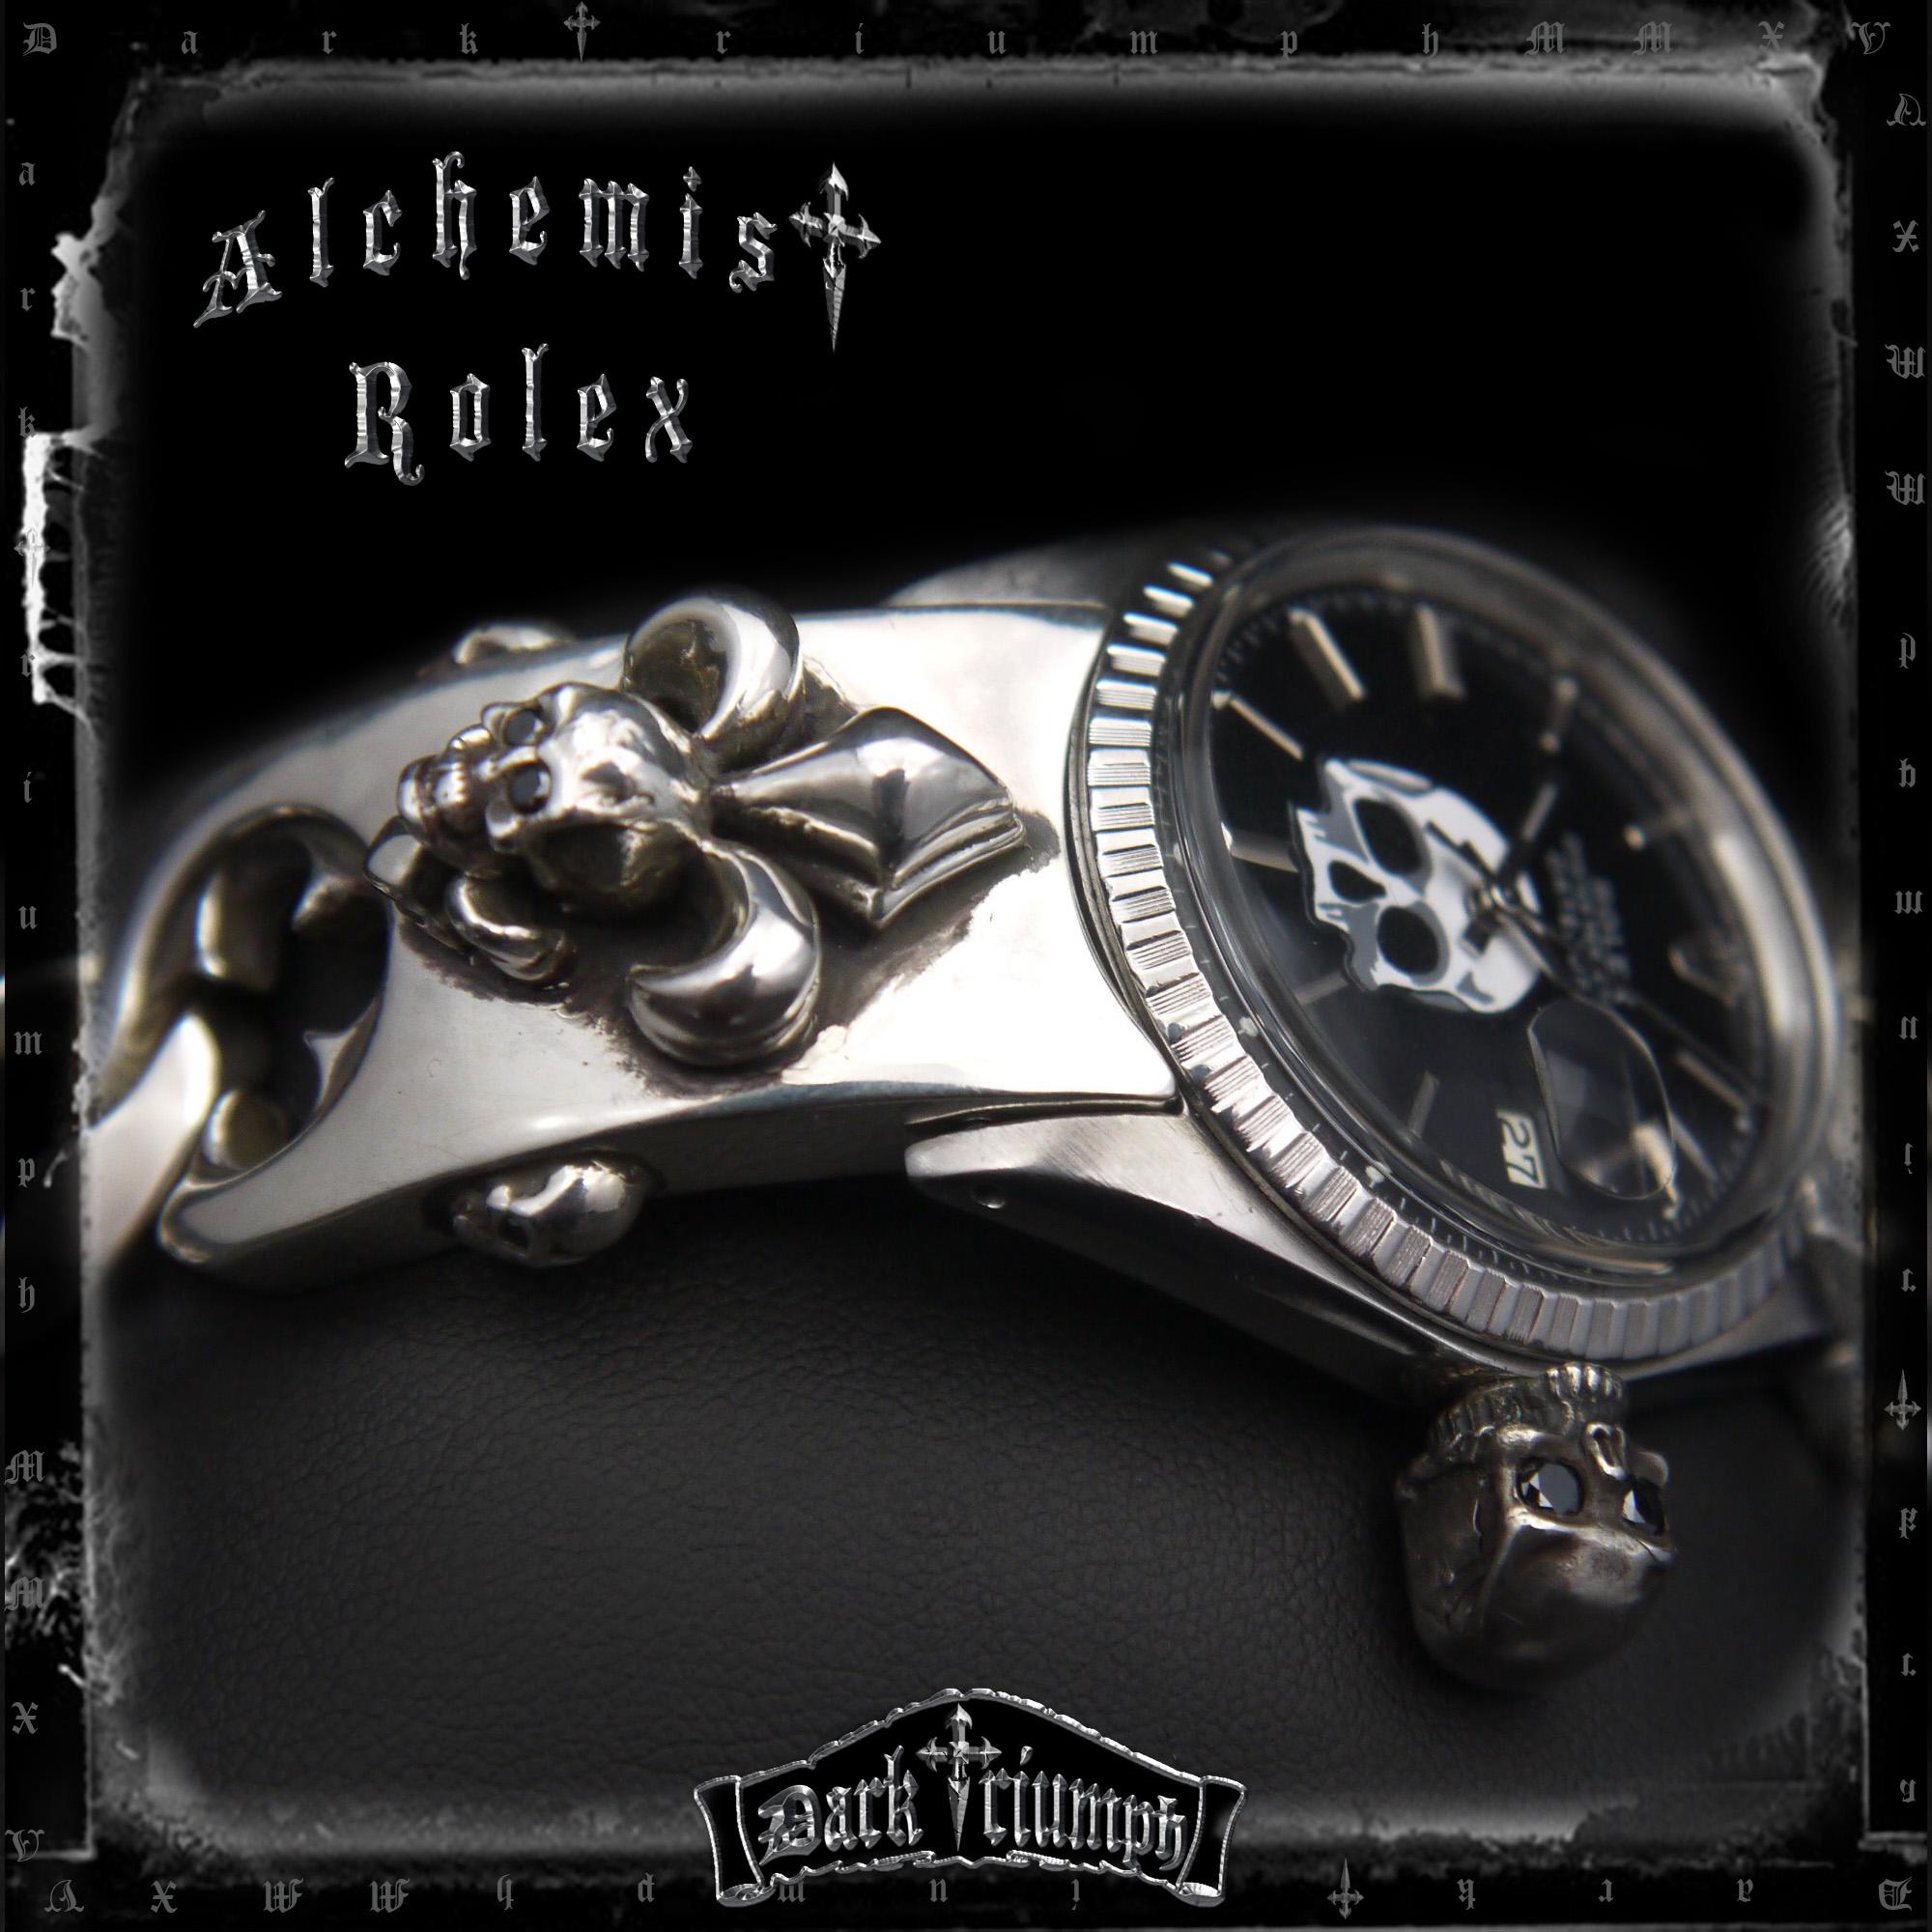 alchemist-rolex-titled.jpg